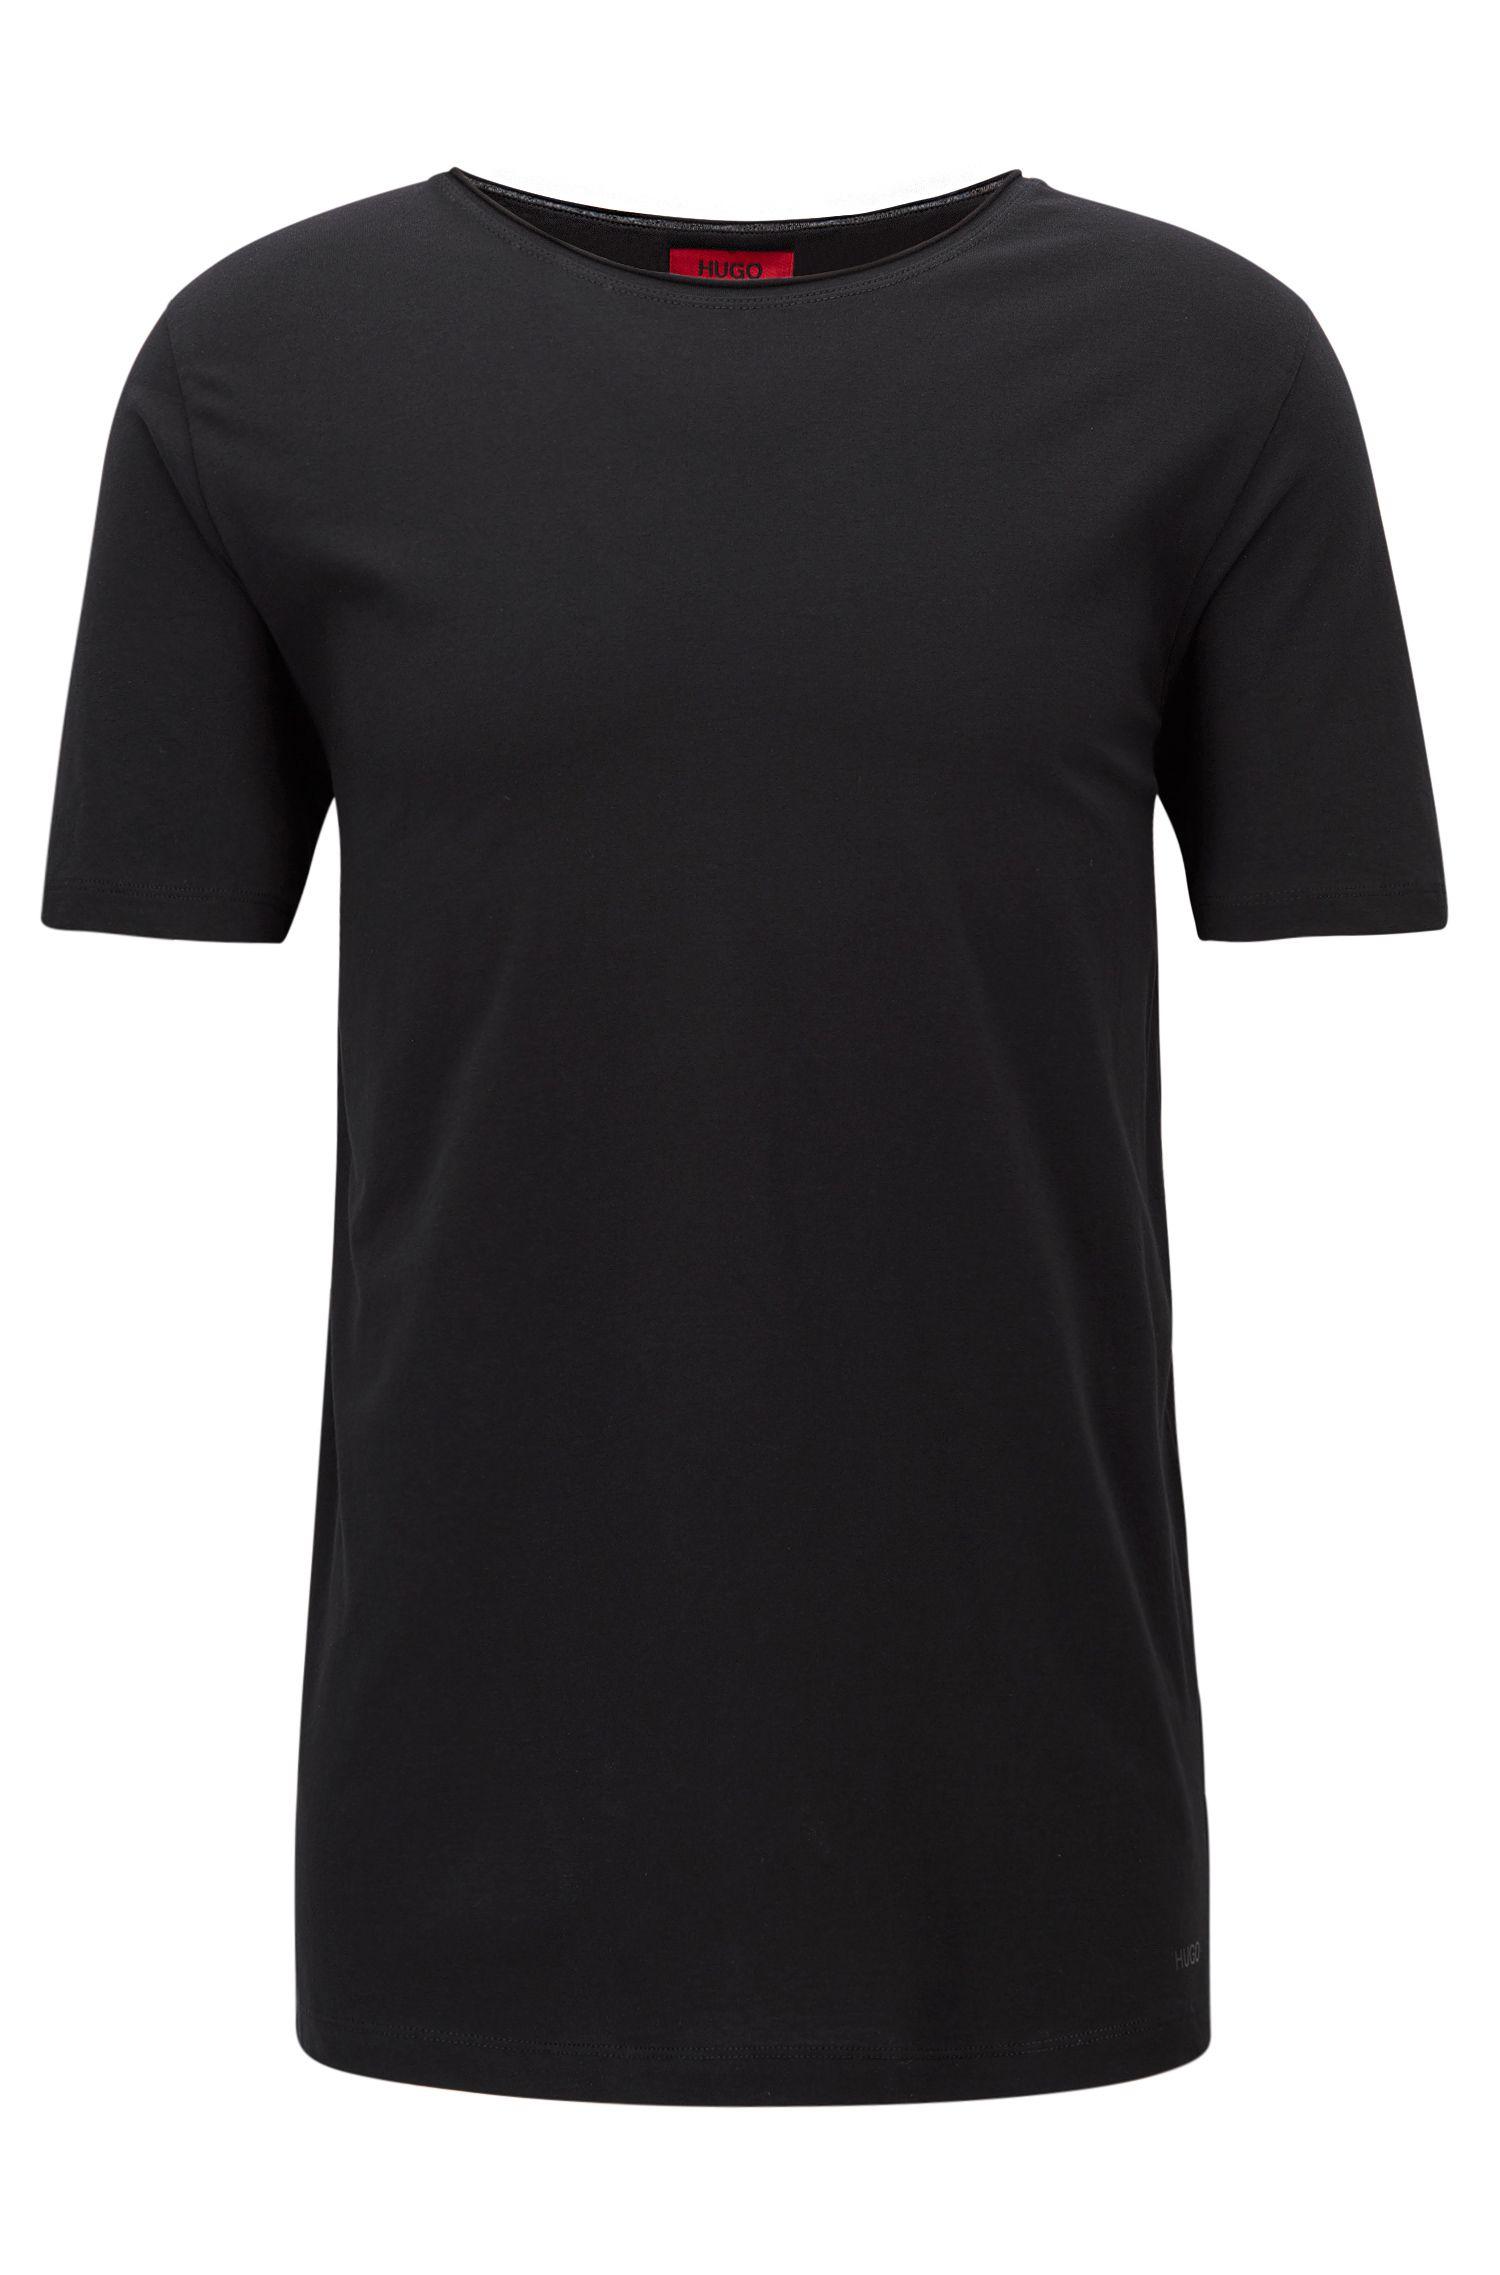 Camiseta relaxed fit con cuello redondo en algodón supima